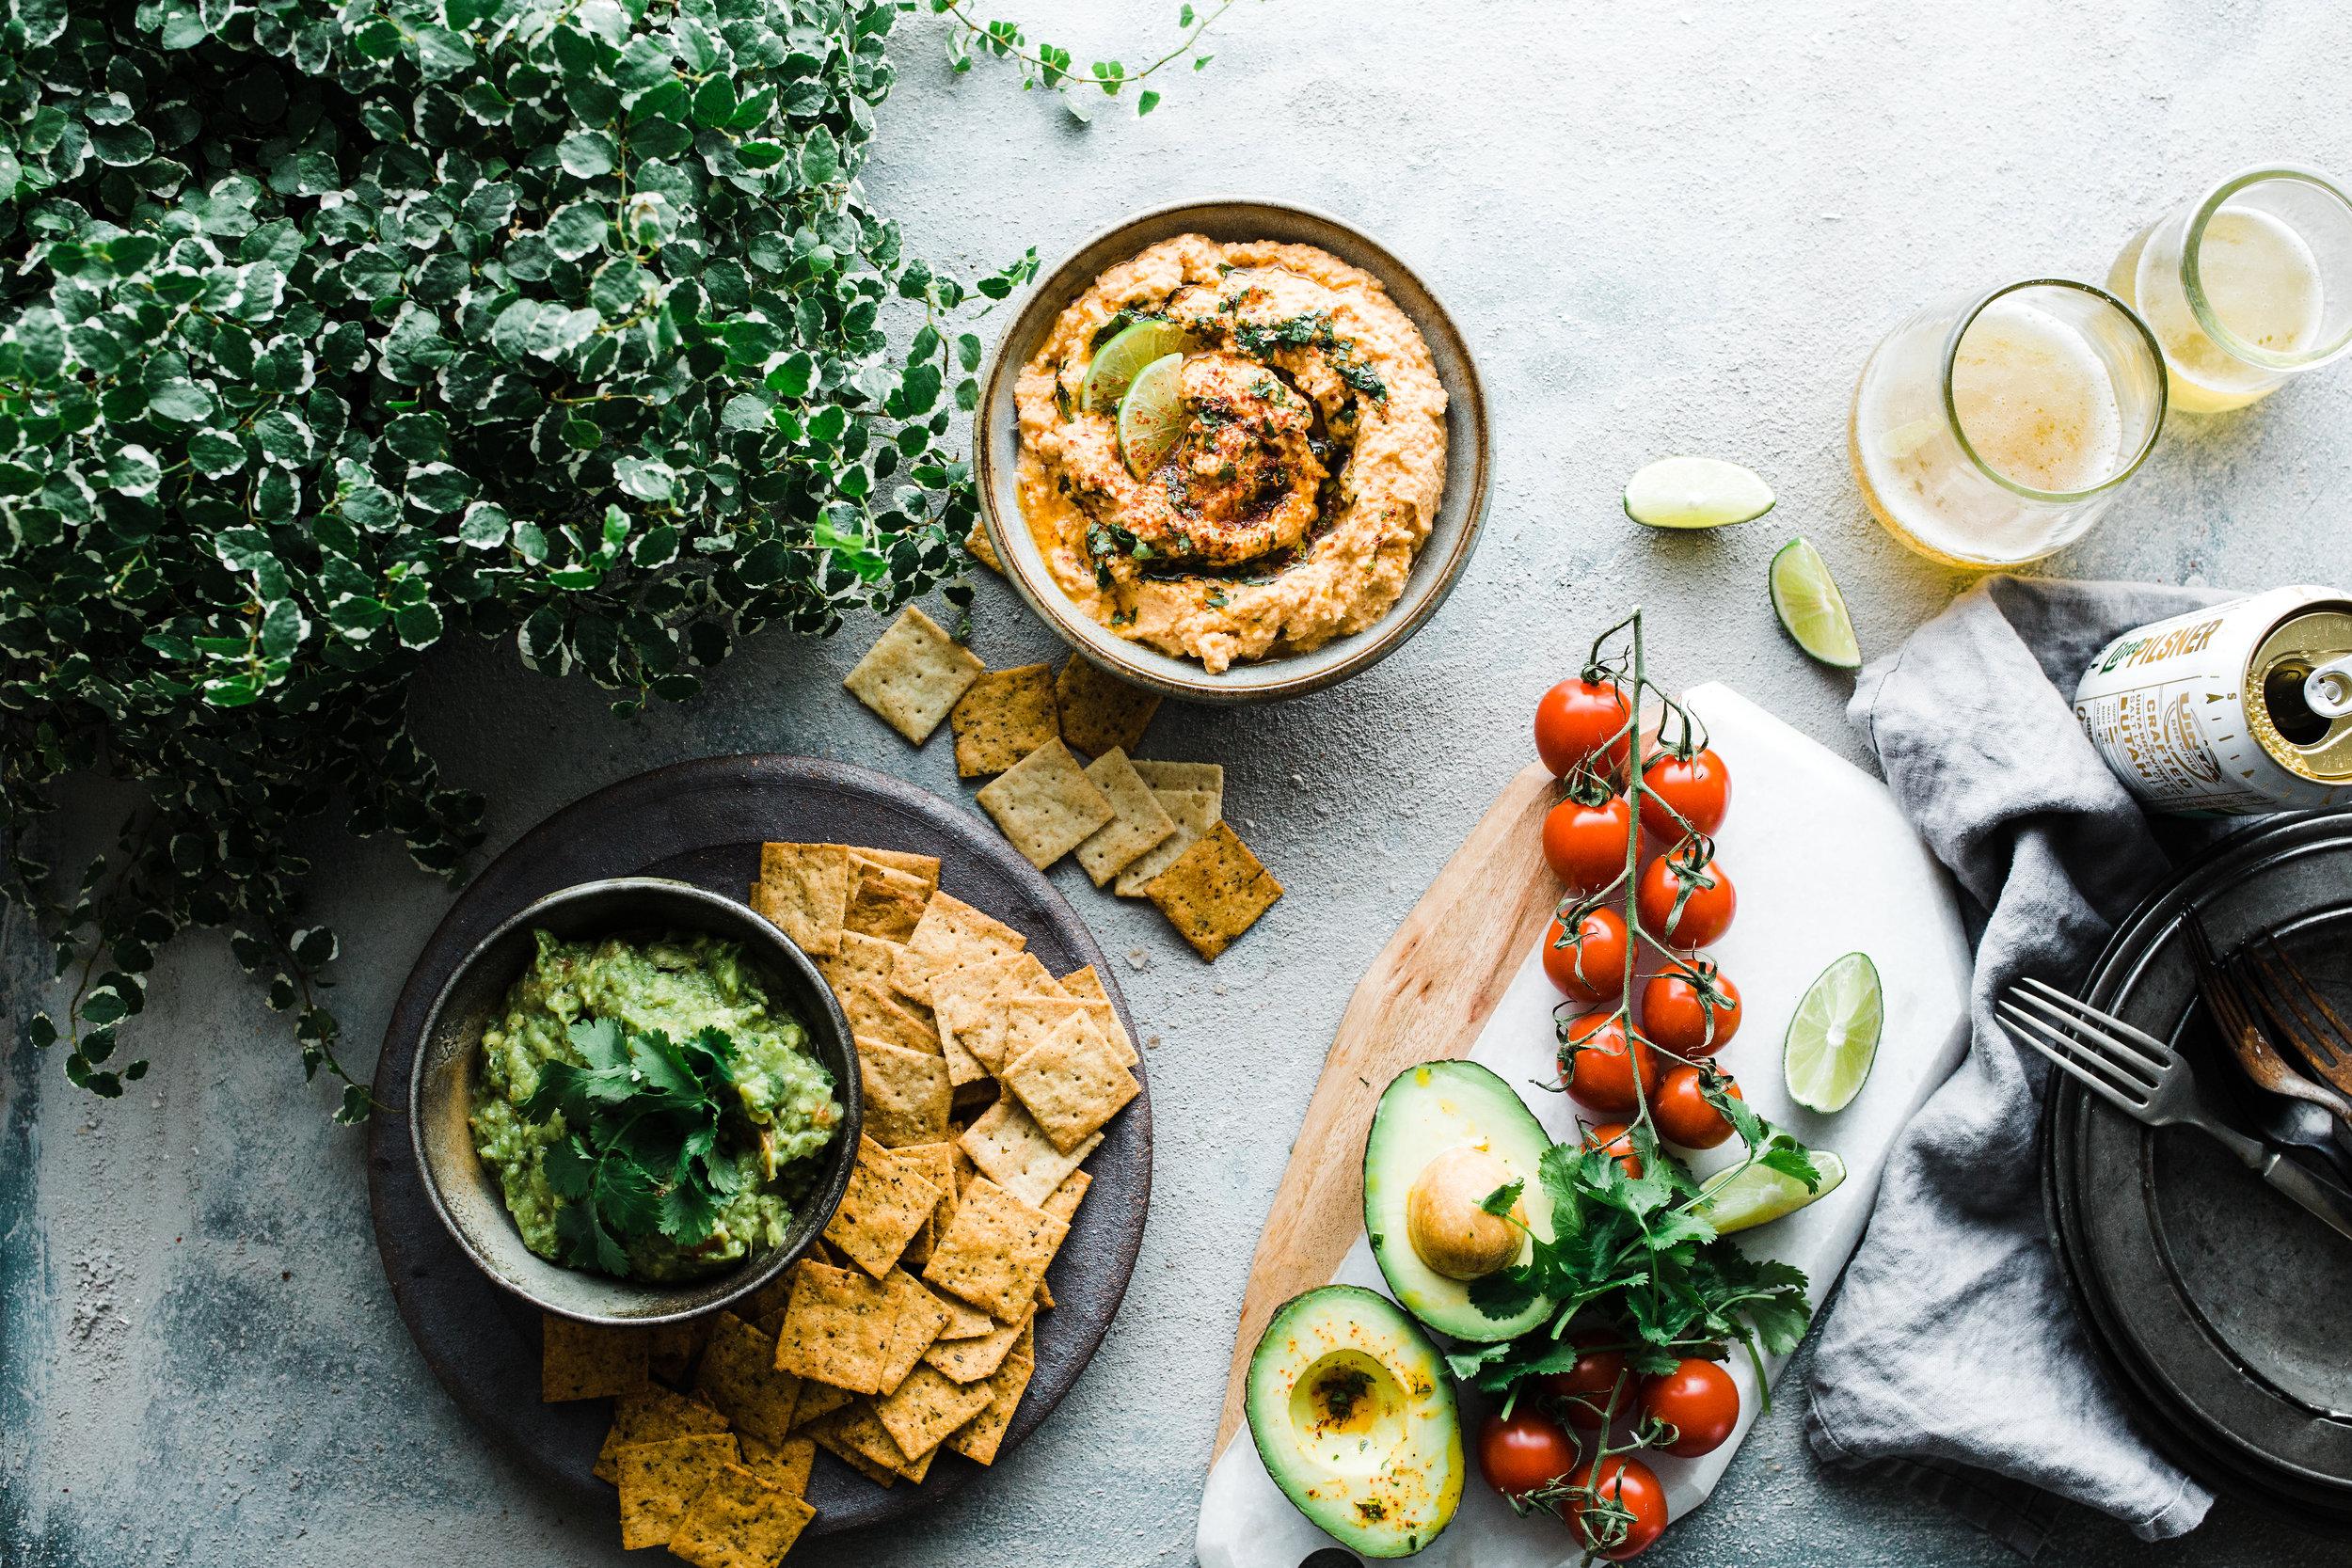 2018-01 Whole Foods - Cauliflower Chipotle Paleo Hummus 4.jpg